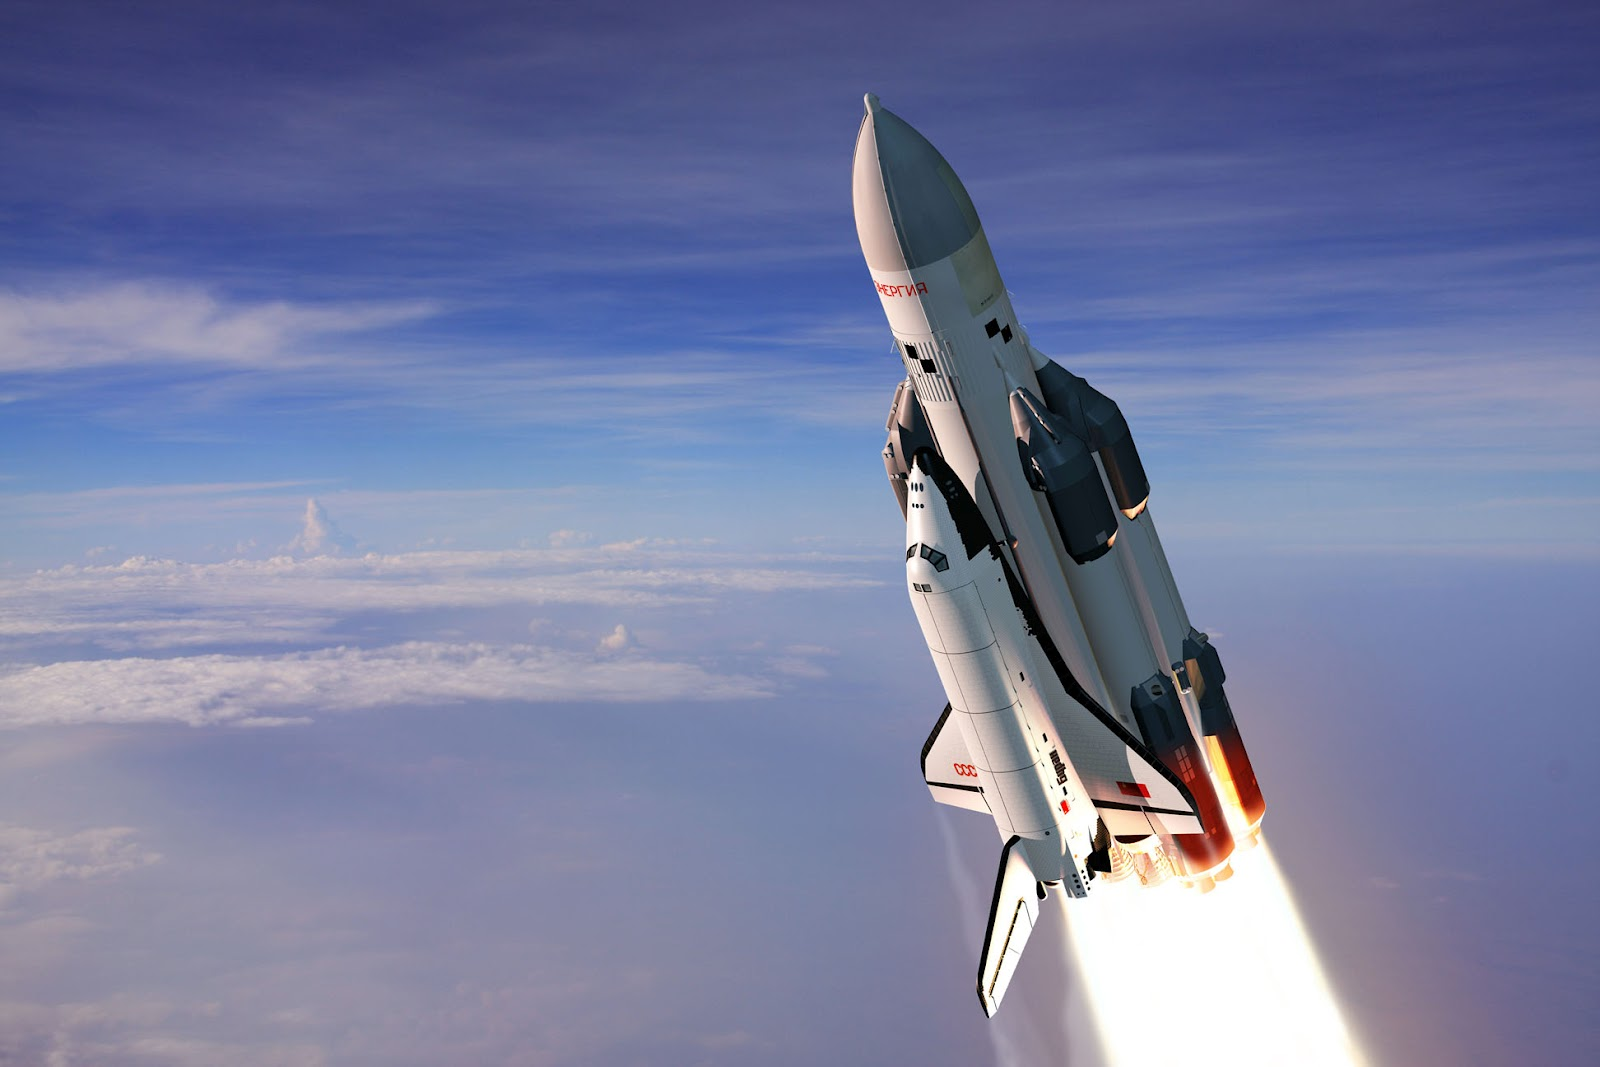 http://2.bp.blogspot.com/-2IIDl26YbjA/T5GPMJN4IHI/AAAAAAAAH7s/lX9ryofQQbo/s1600/buran_space_shuttle.jpg